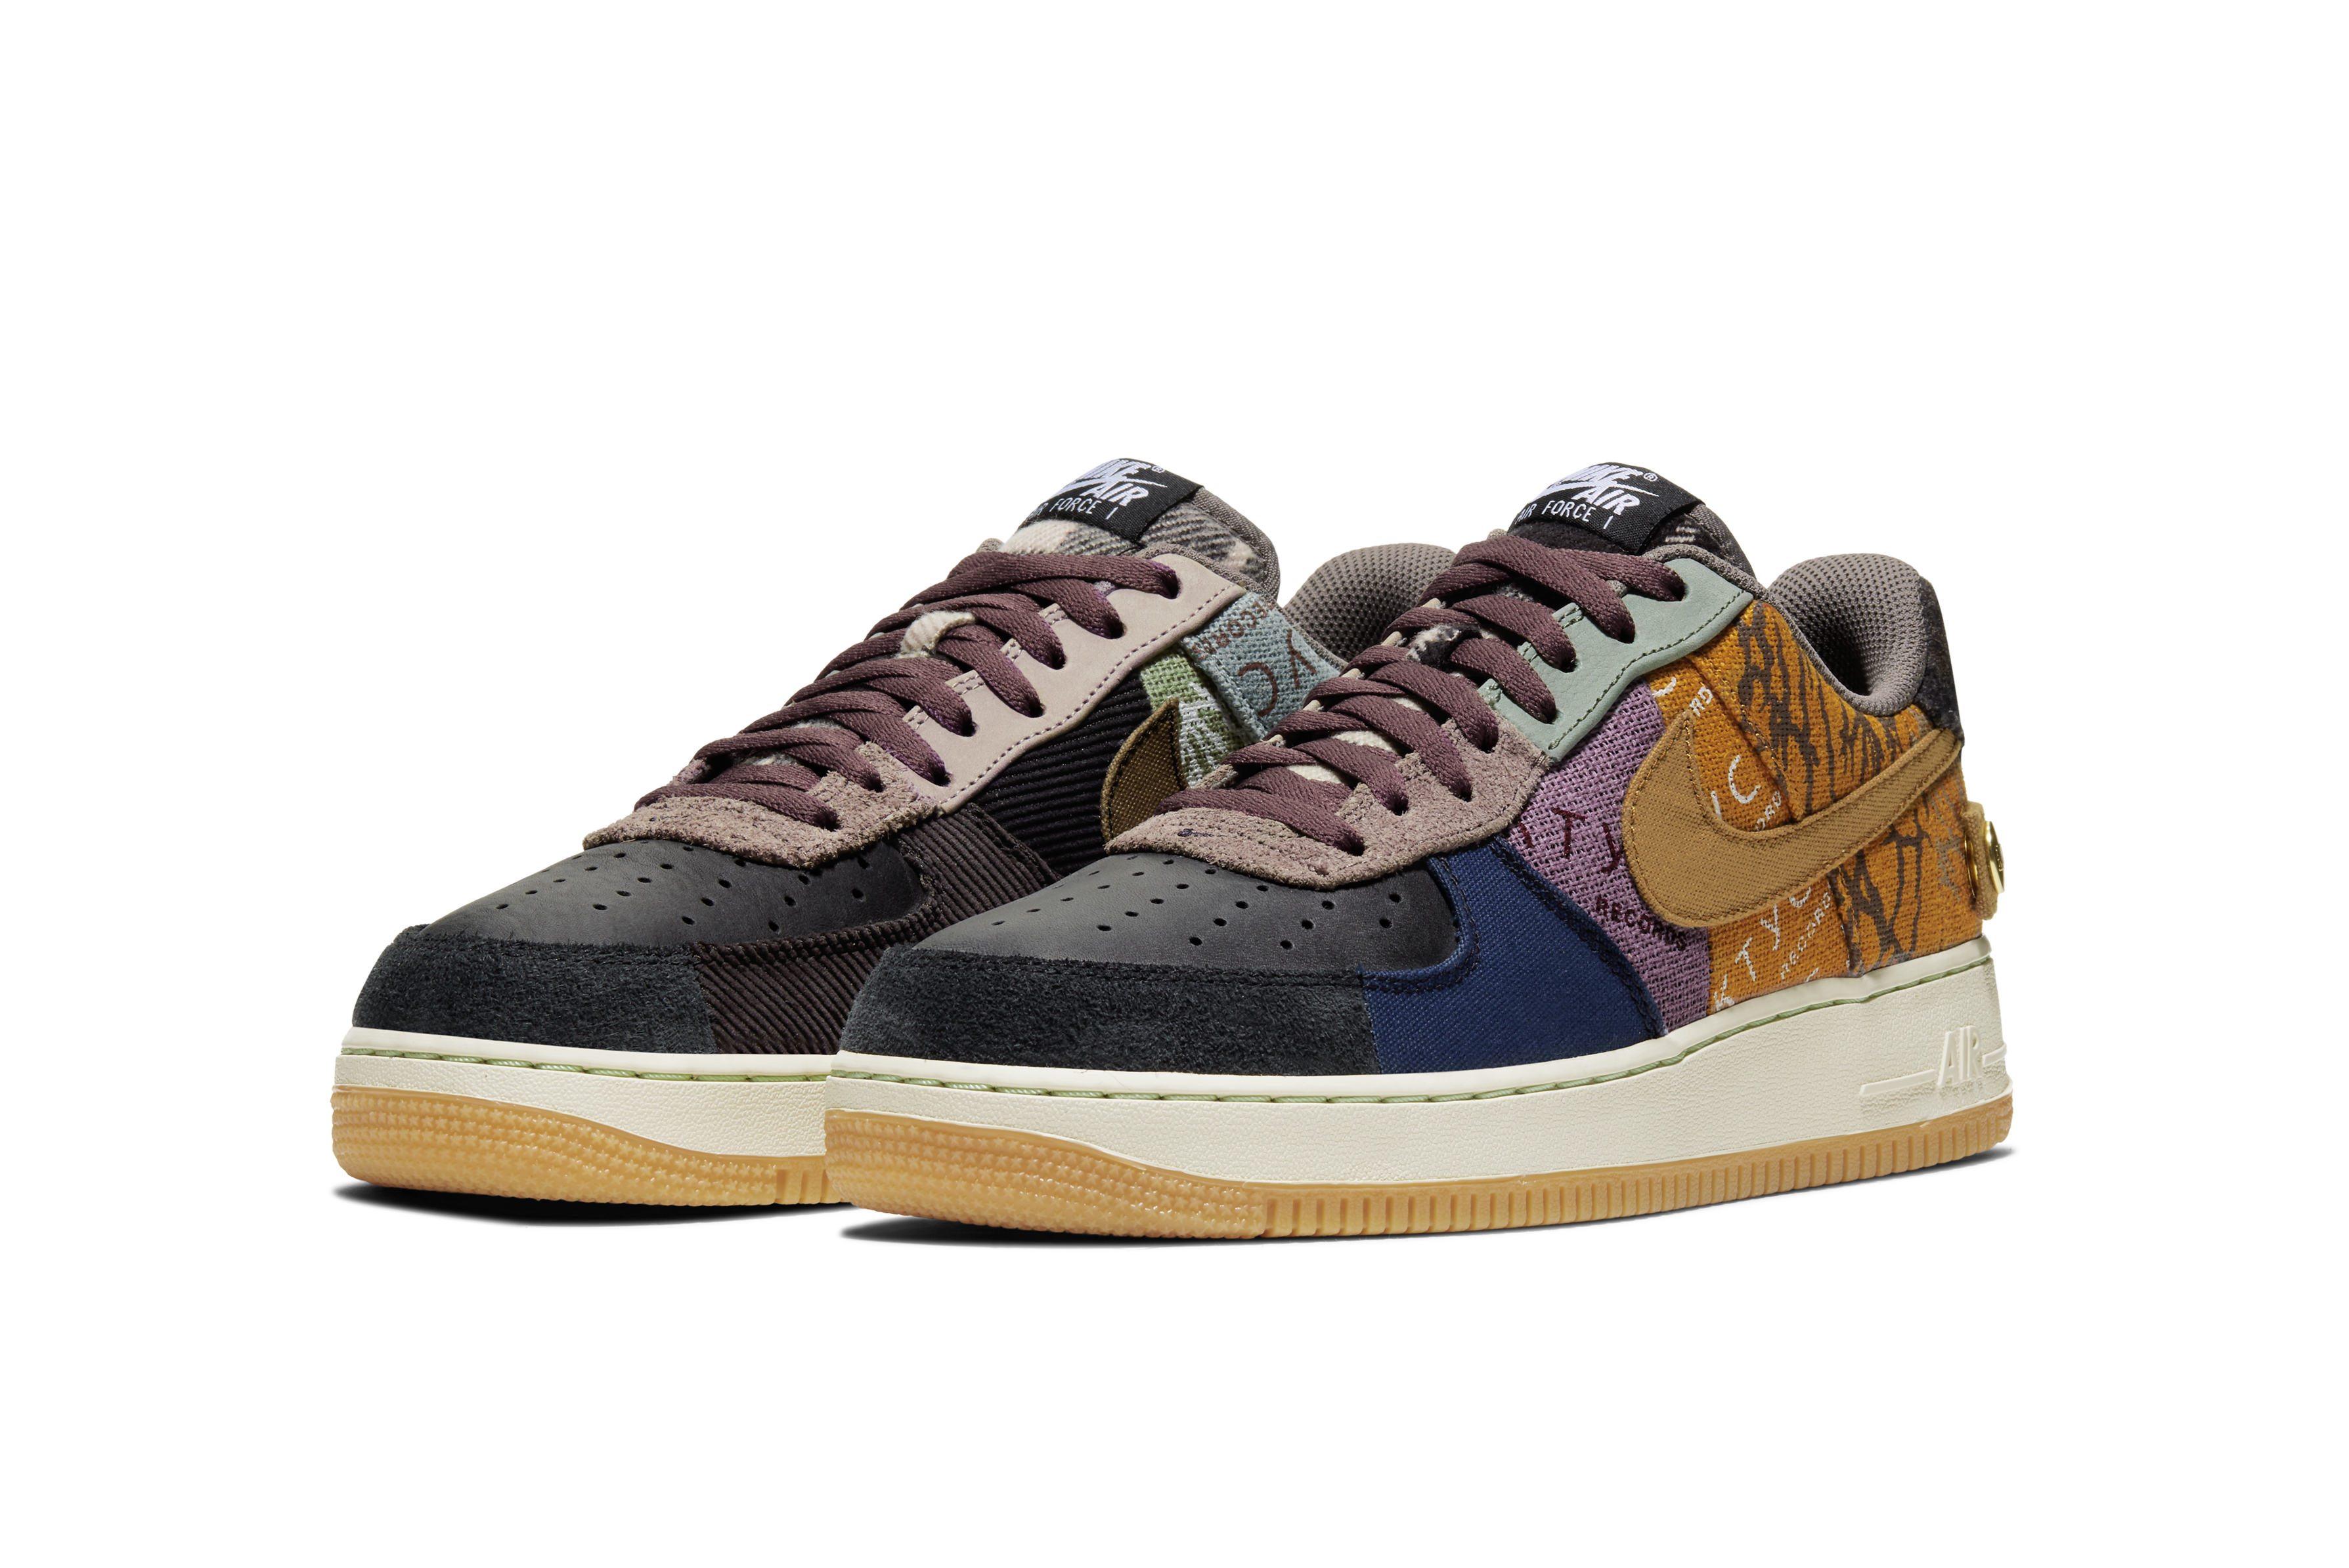 Nike x Travis Scott Air Force 1 - CN2405-900